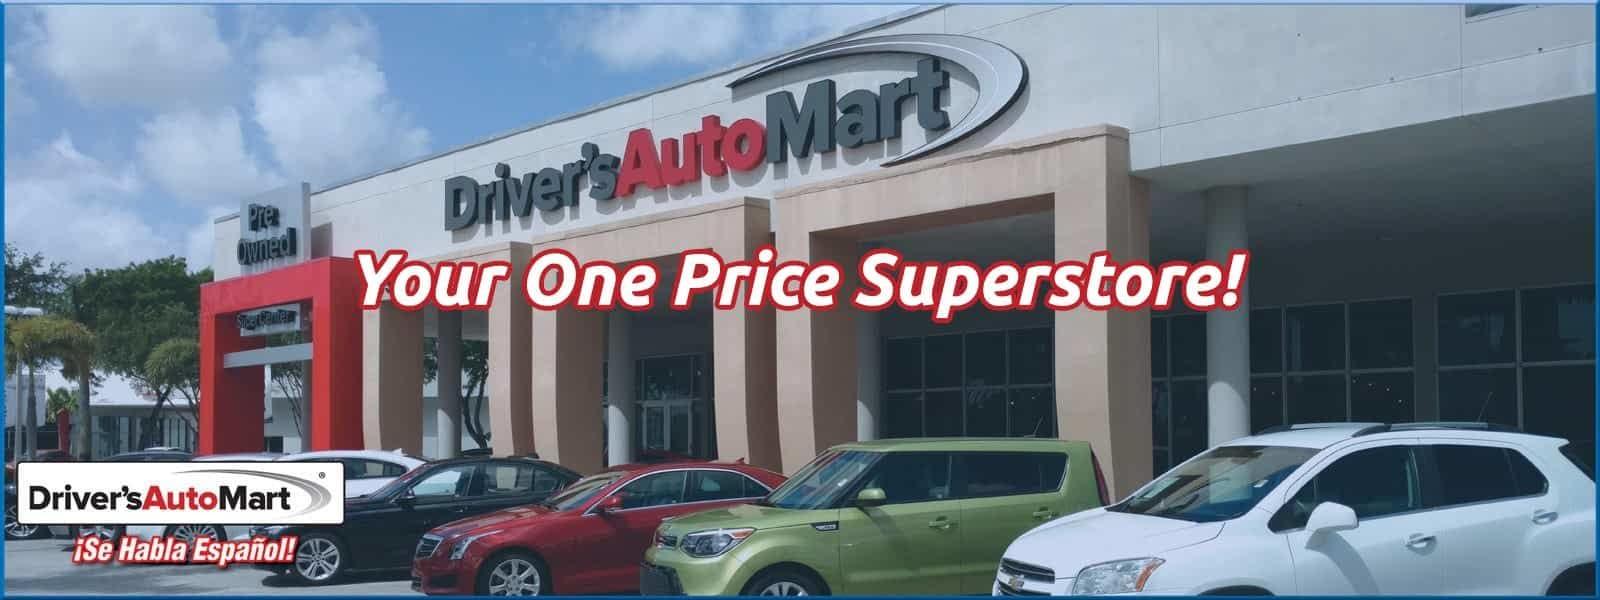 Florida Nisson Car Dealer Buy One Get One Free